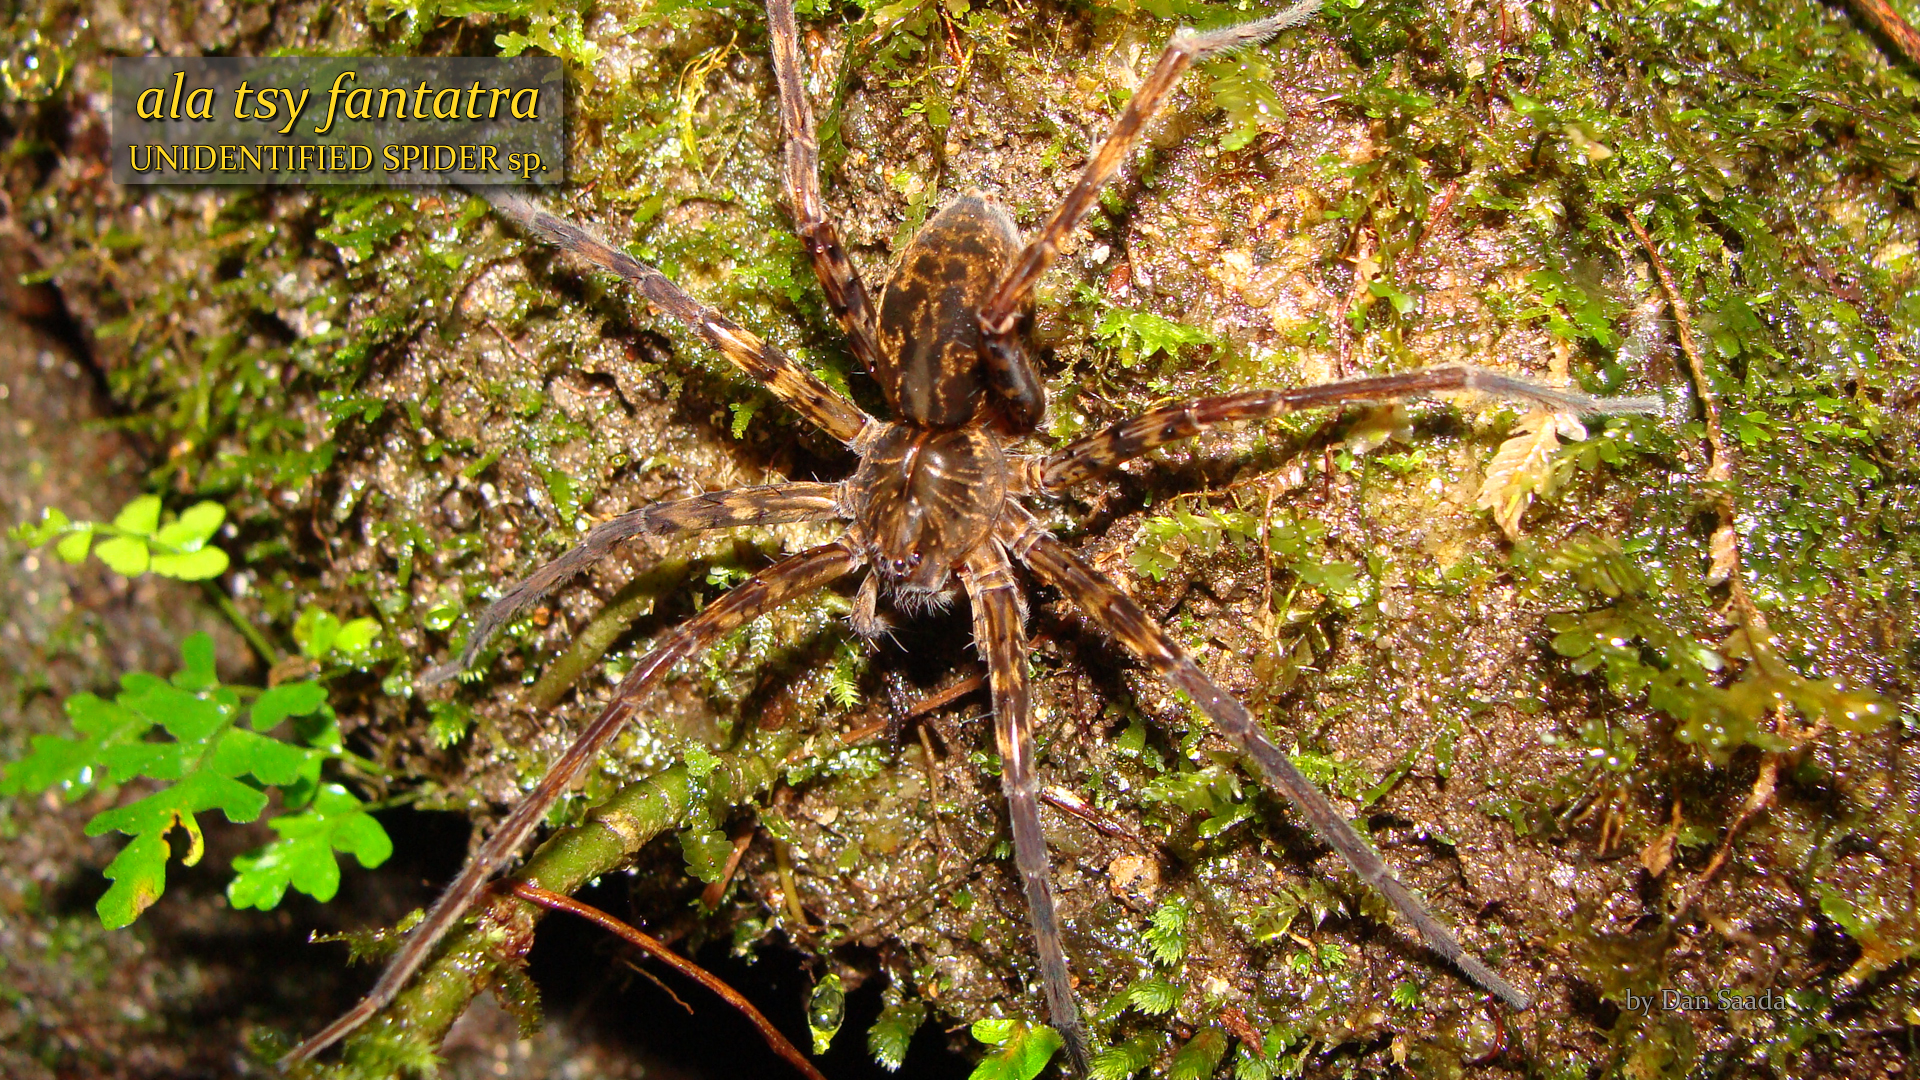 Unidentified spider 2- Dan Saada.jpg